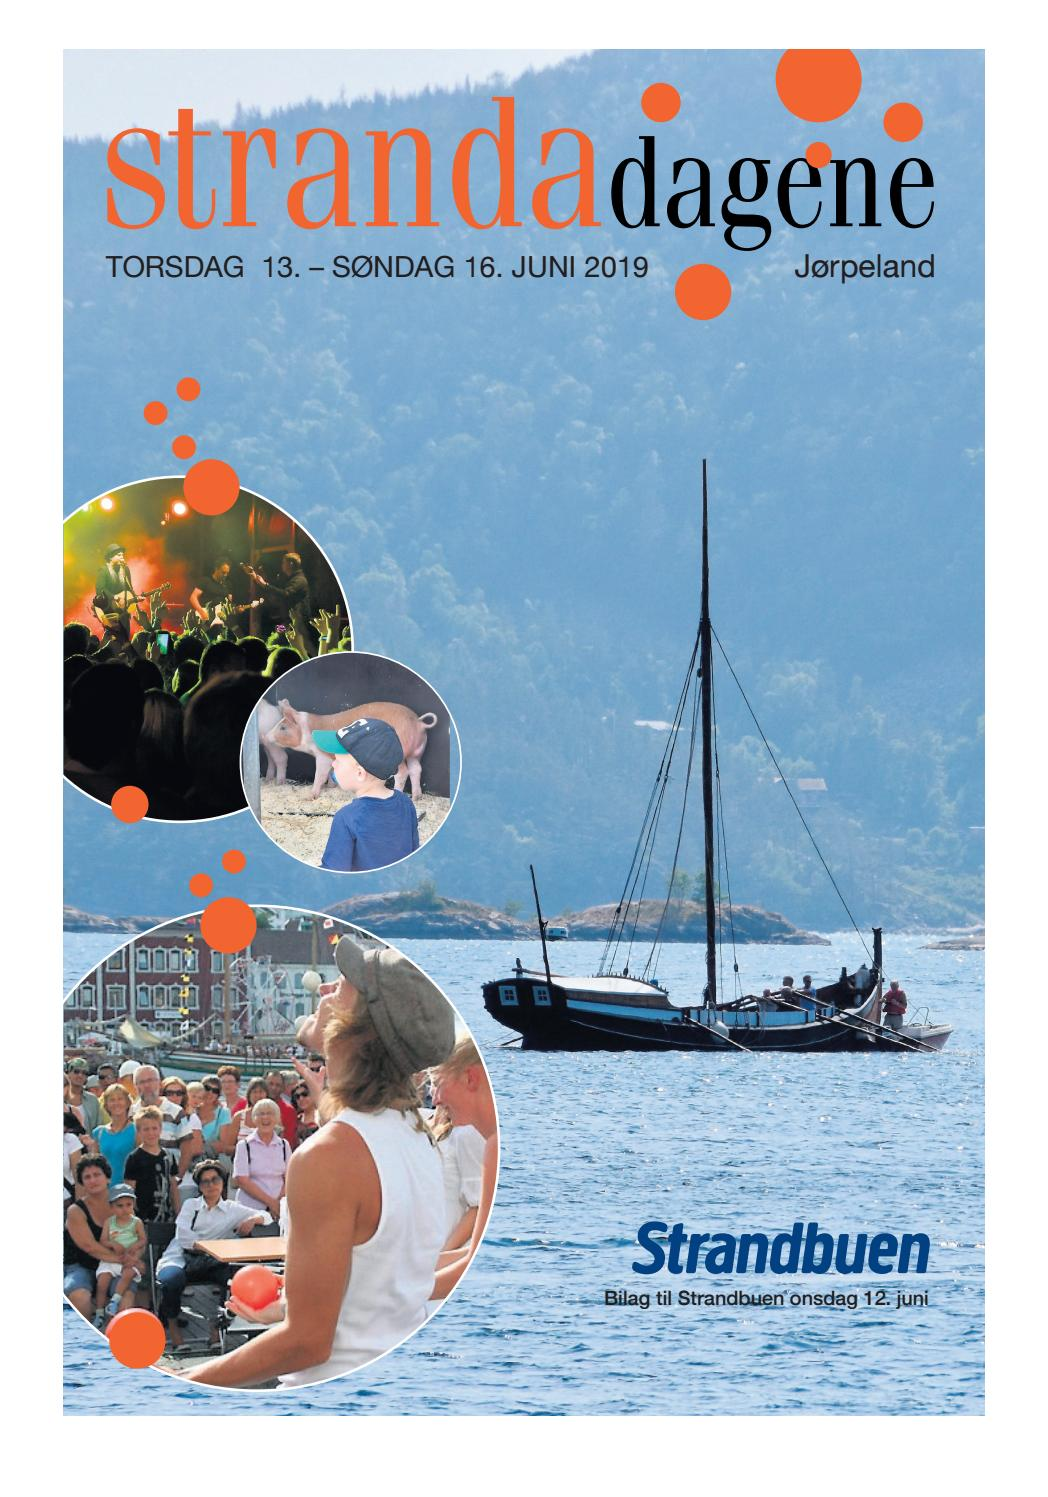 6829d0e8 Strandadagsbilag 2019 by nordsjomedia - issuu